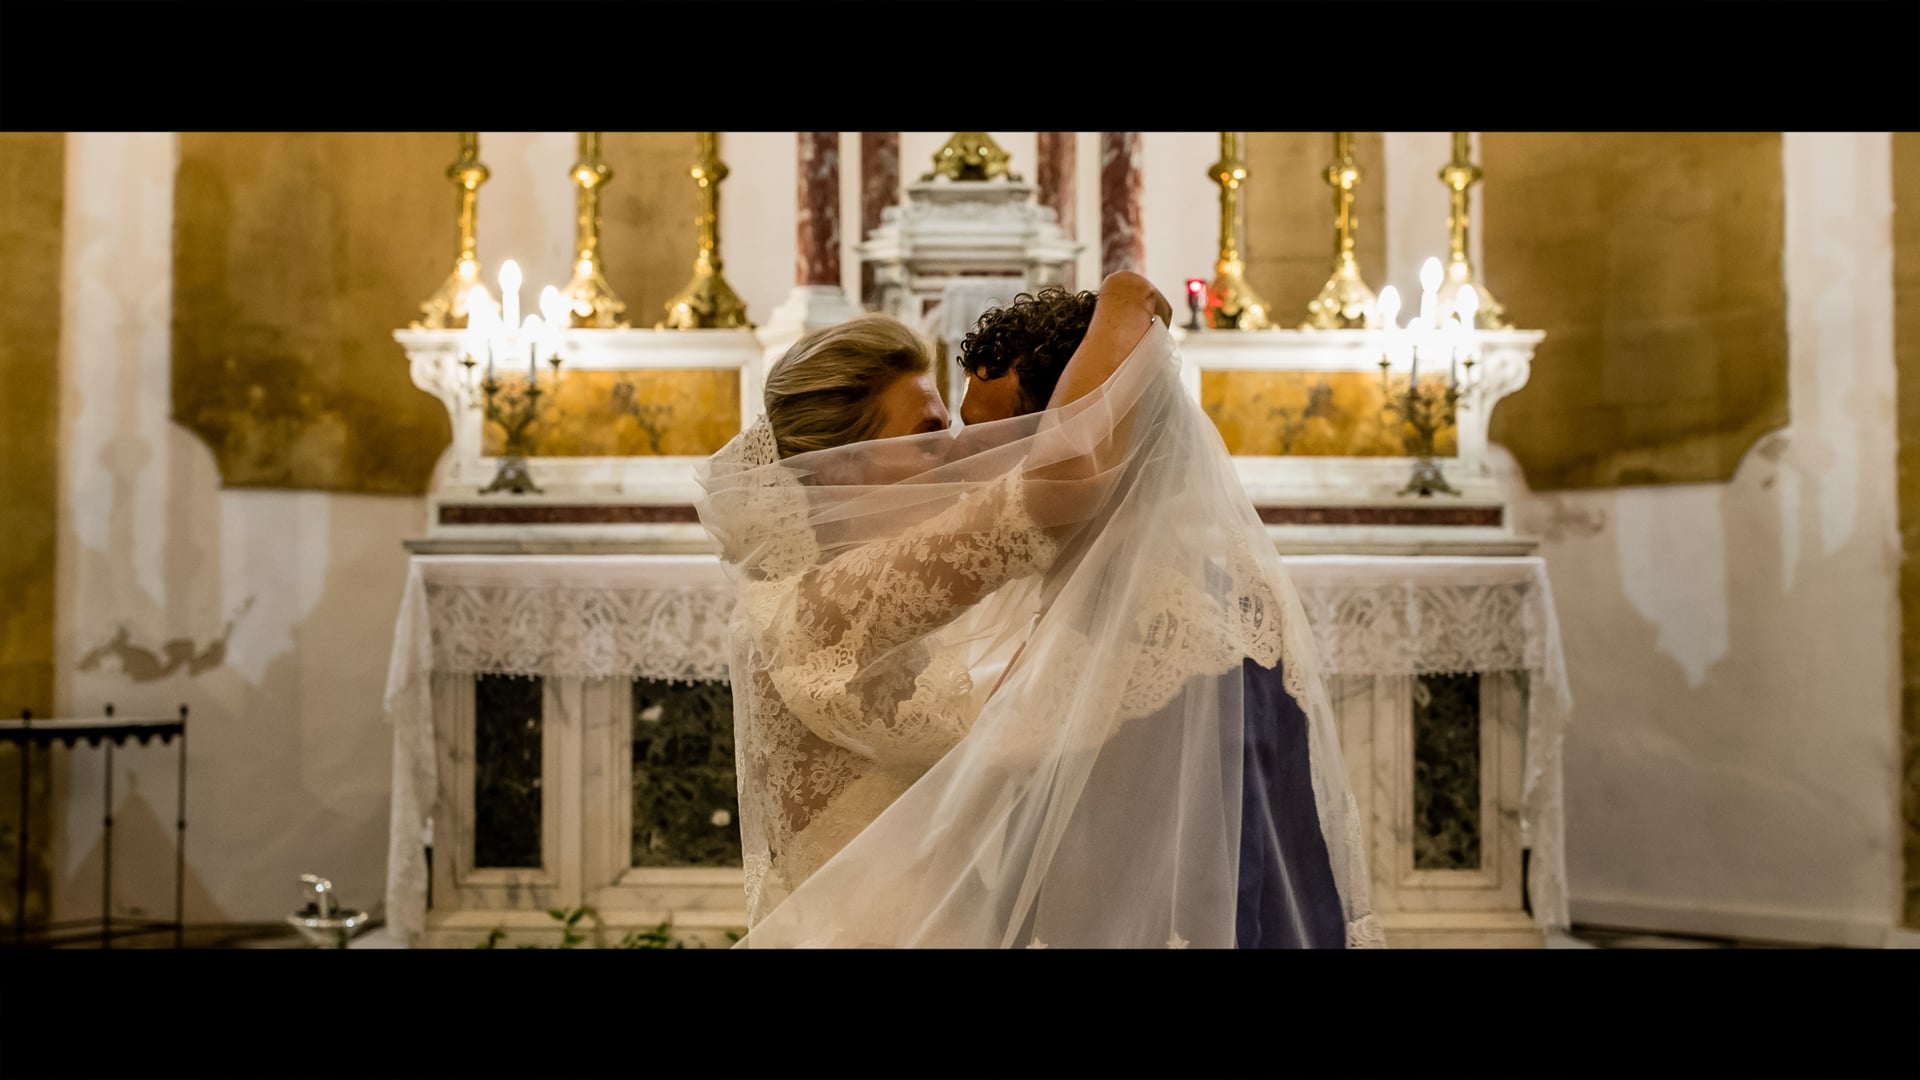 FRANCE: FLIP & MAGALI - SAME-DAY FILM